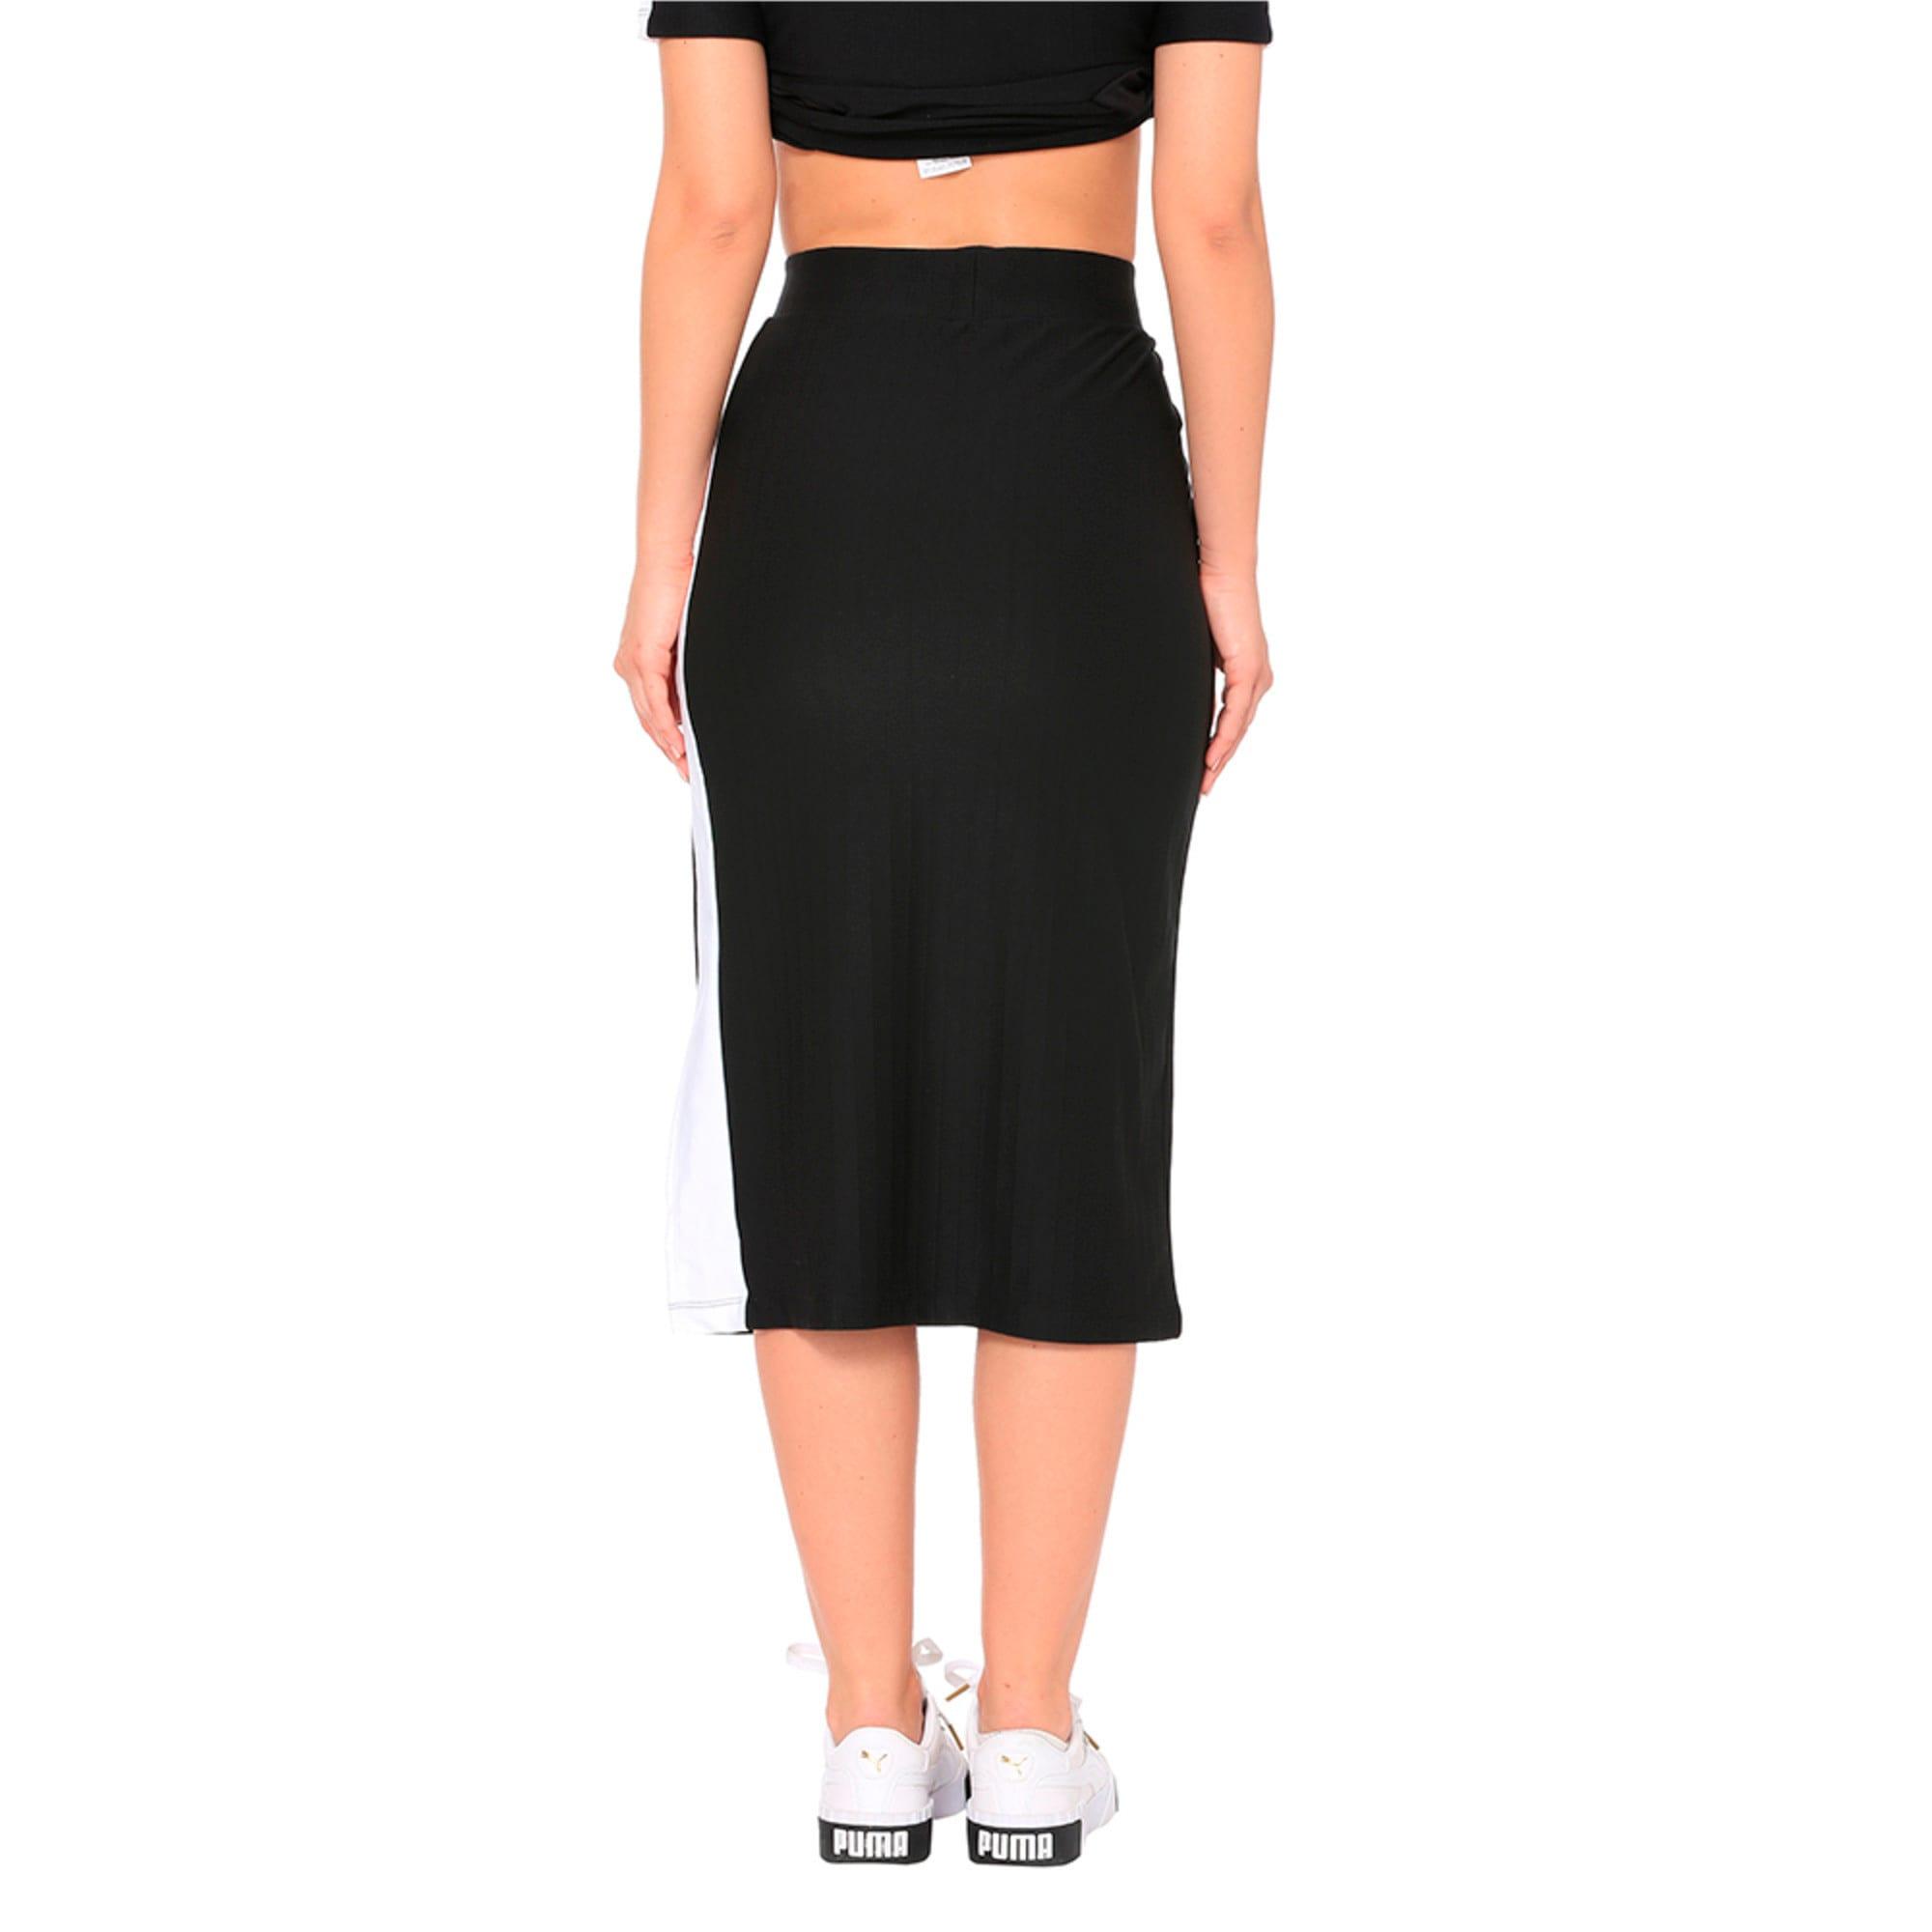 Thumbnail 2 of Classics Women's Skirt, Puma Black, medium-IND